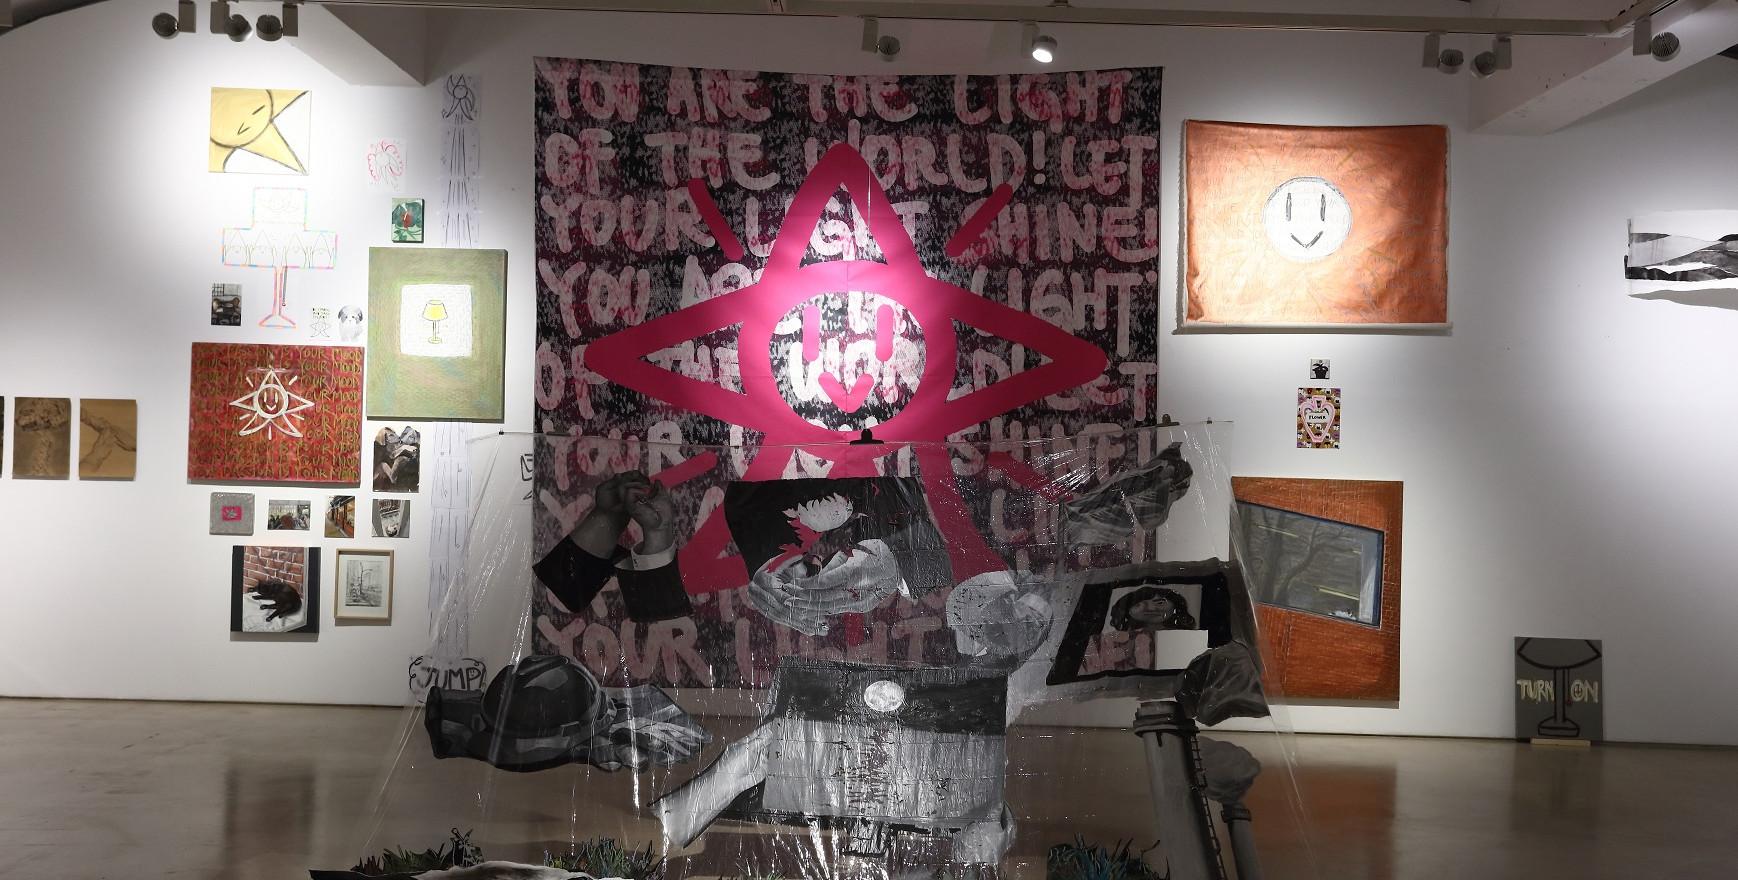 Link, 300 x 300 cm, 현수막, 비닐 위에 아크릴, 종이위에 목탄, 프린트 , 2019